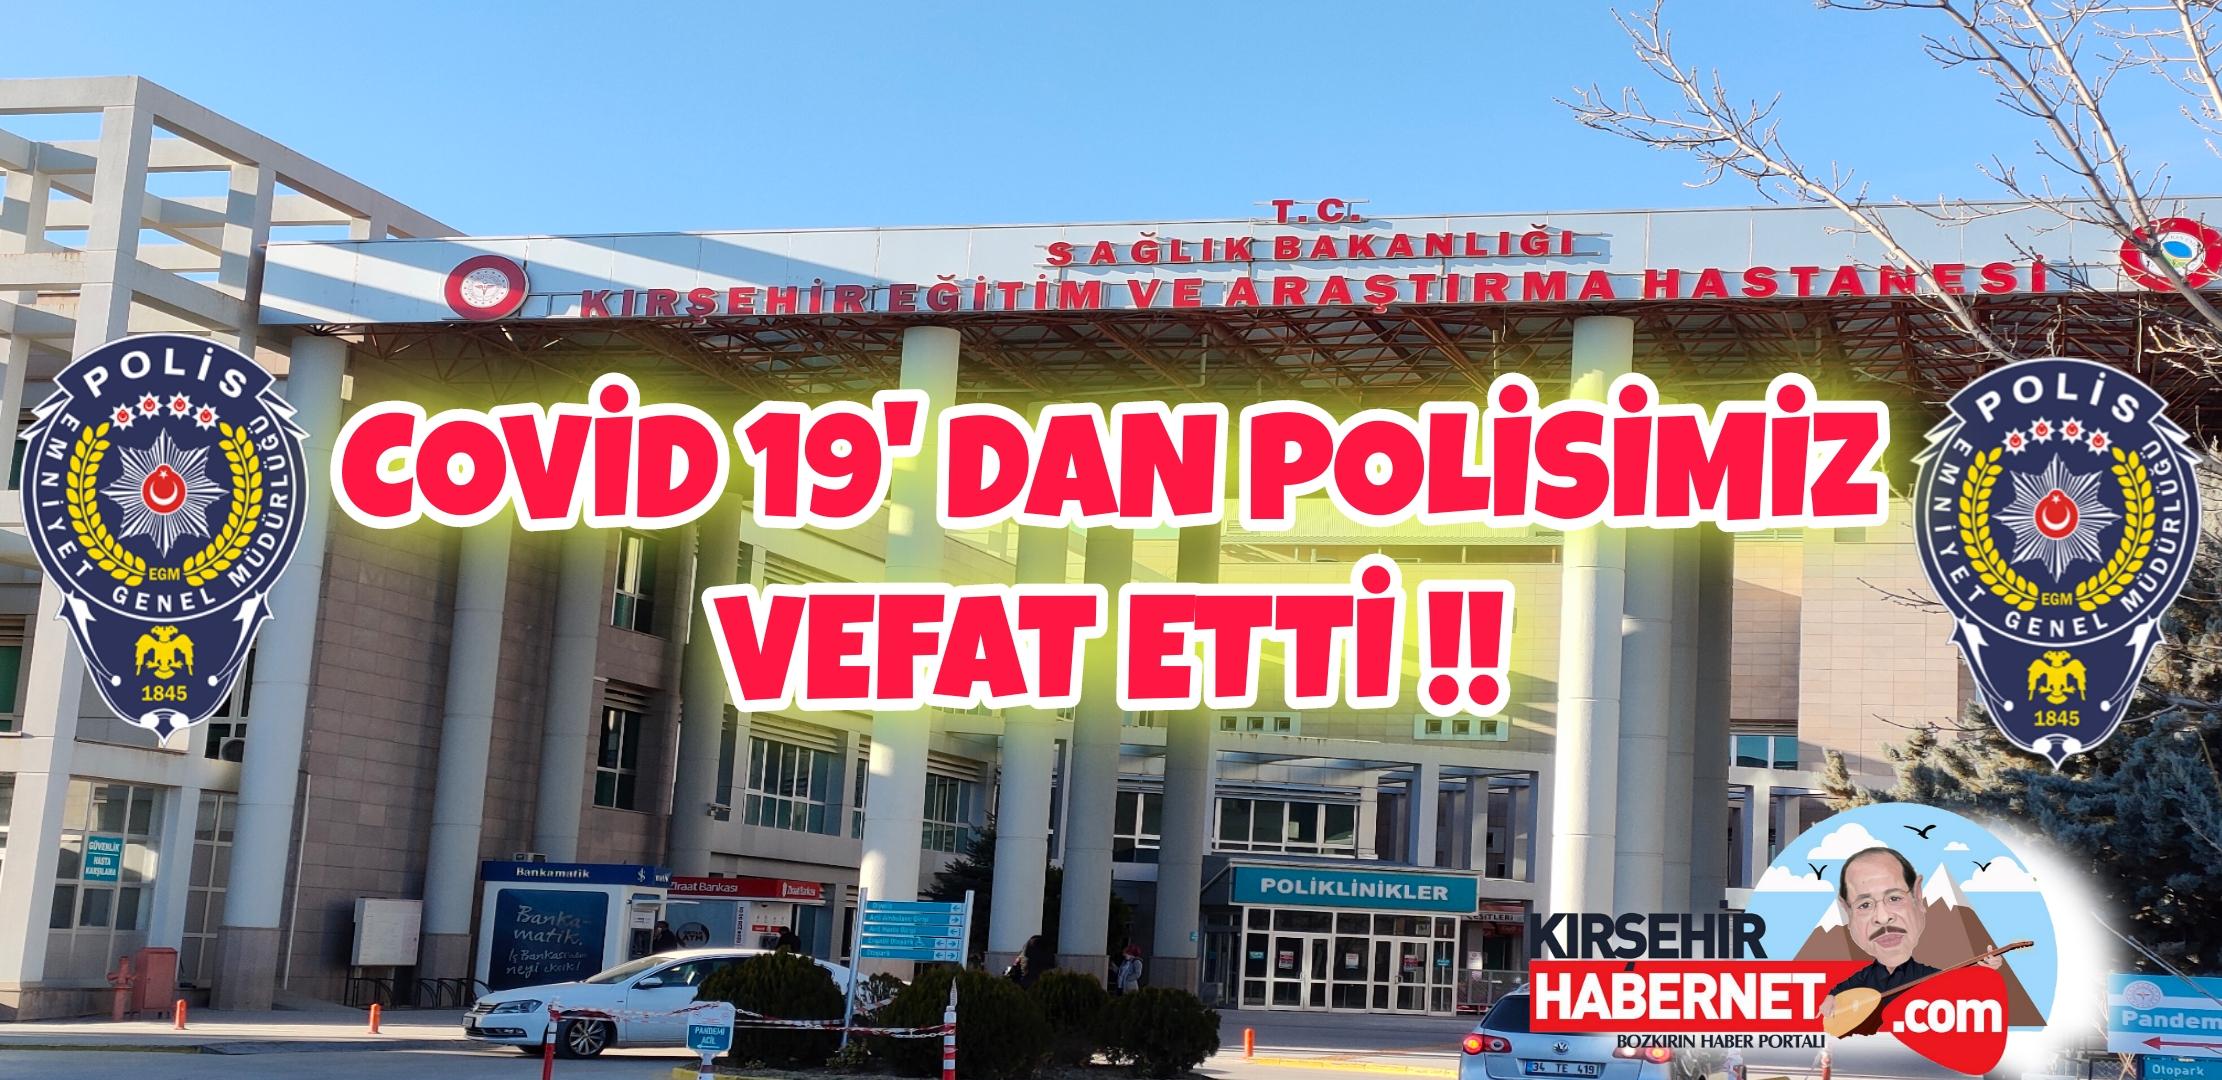 POLİSİMİZ COVİD 19 DAN VEFAT ETTİ !!